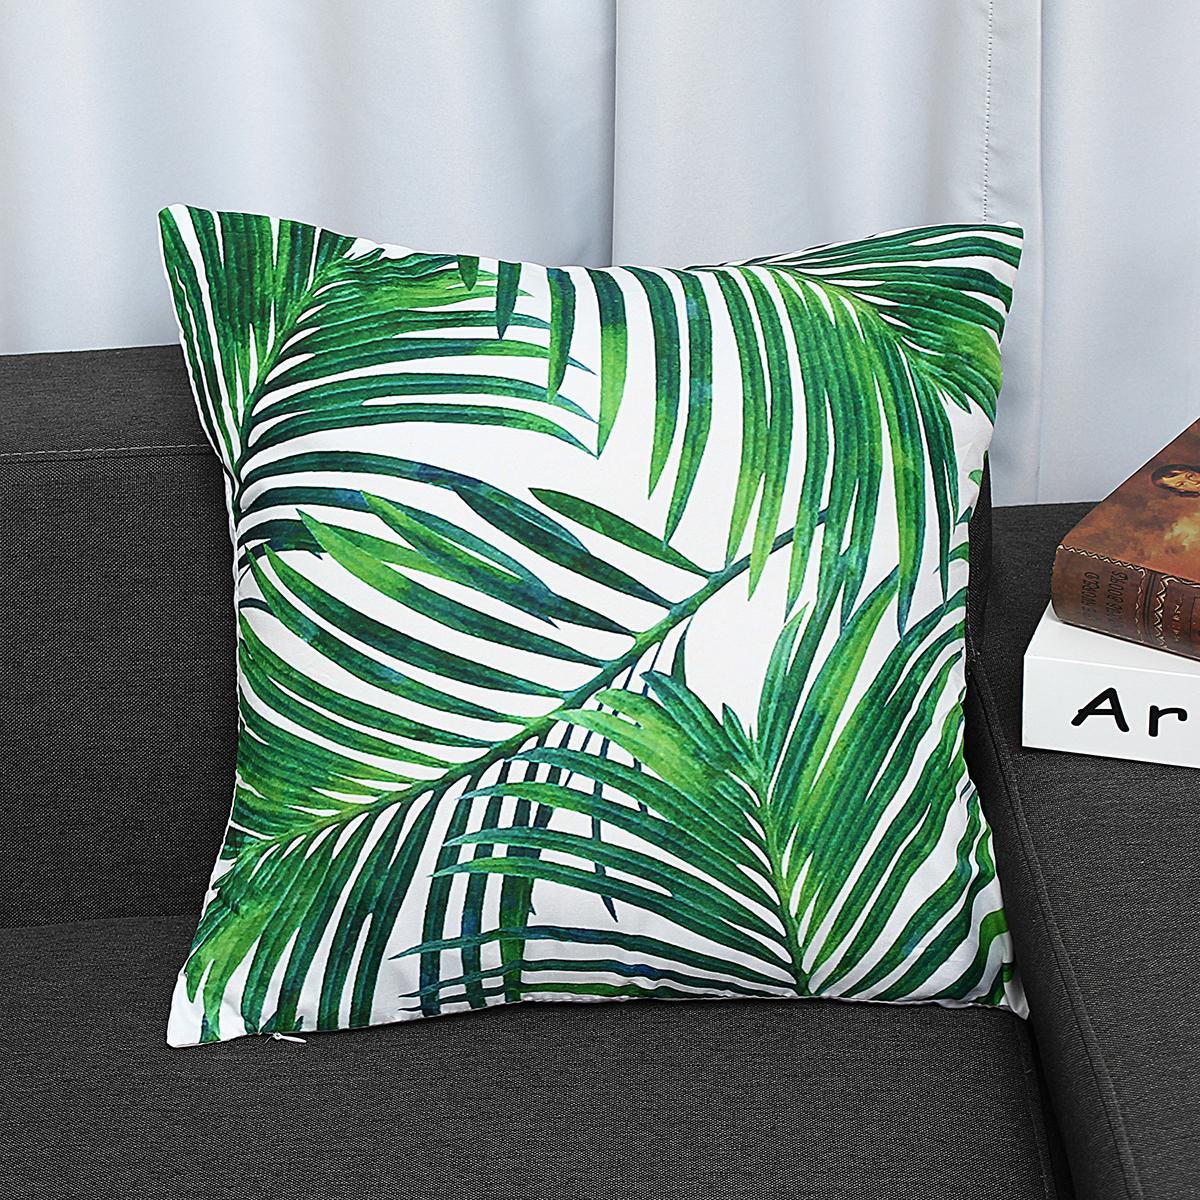 Velvet Pillow Case Cover Green Bedding Leaves Throw Sofa Car Waist Cushion Home Decor Tpr138 21 Buy Online At Best Prices In Bangladesh Daraz Com Bd